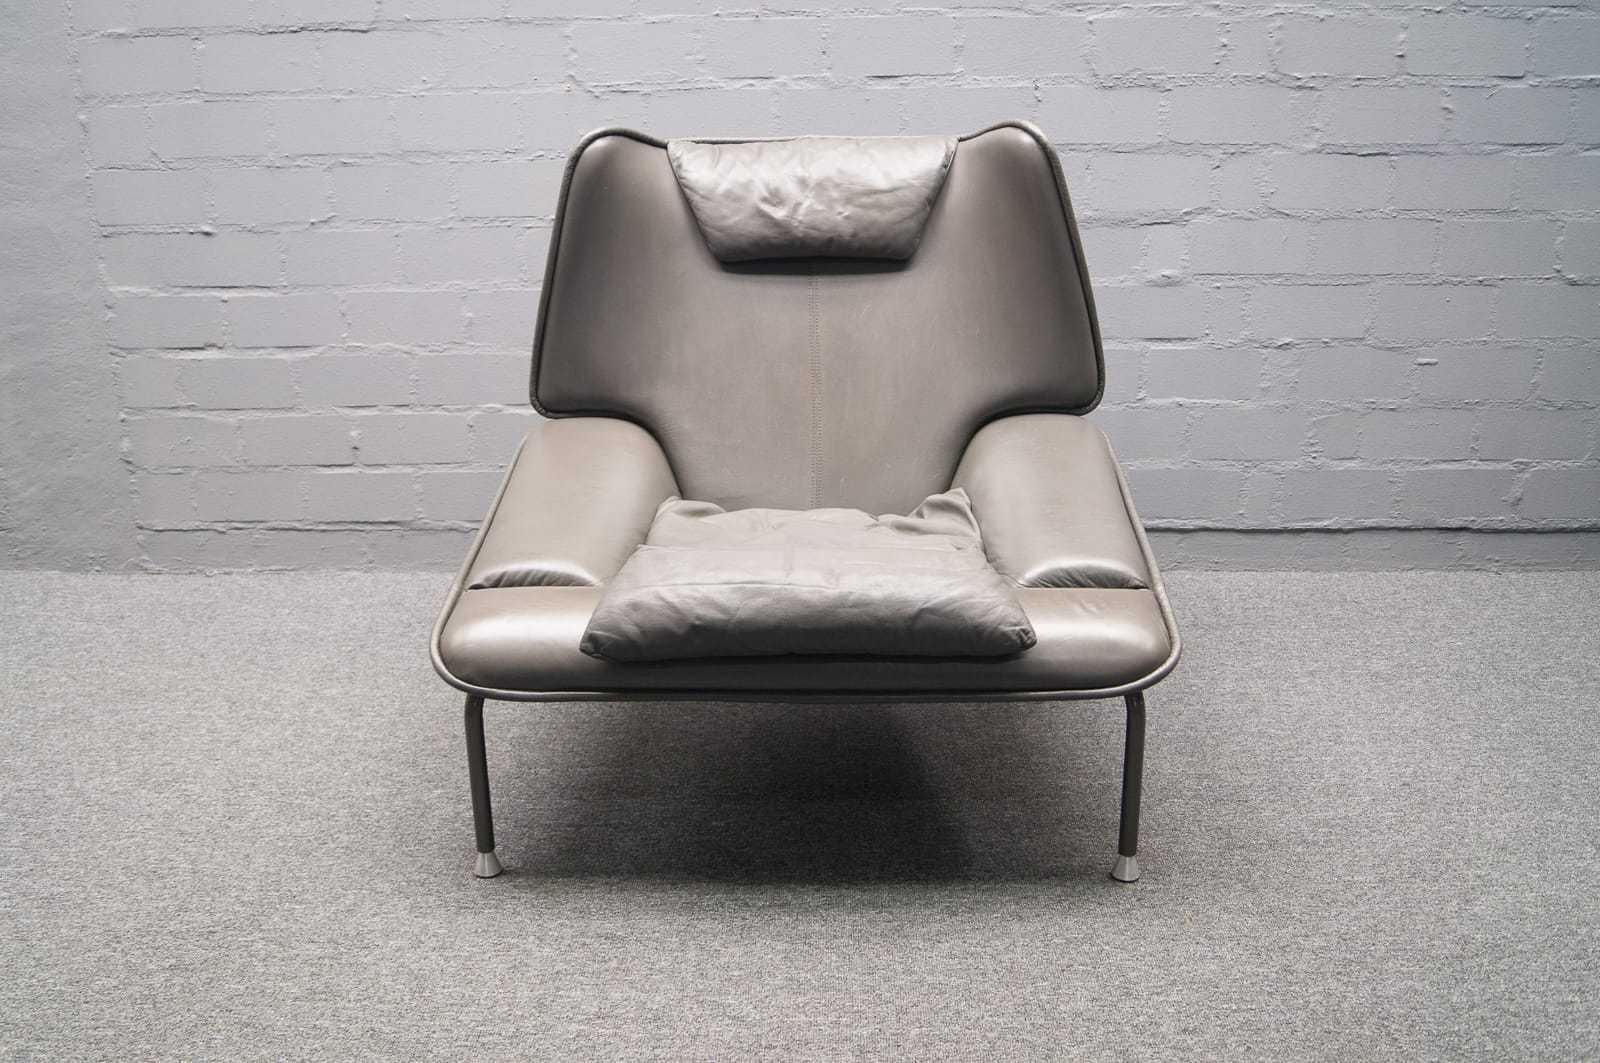 leder verstellbarer ohrenbackensessel mit hocker ottomane highback lounge chair. Black Bedroom Furniture Sets. Home Design Ideas